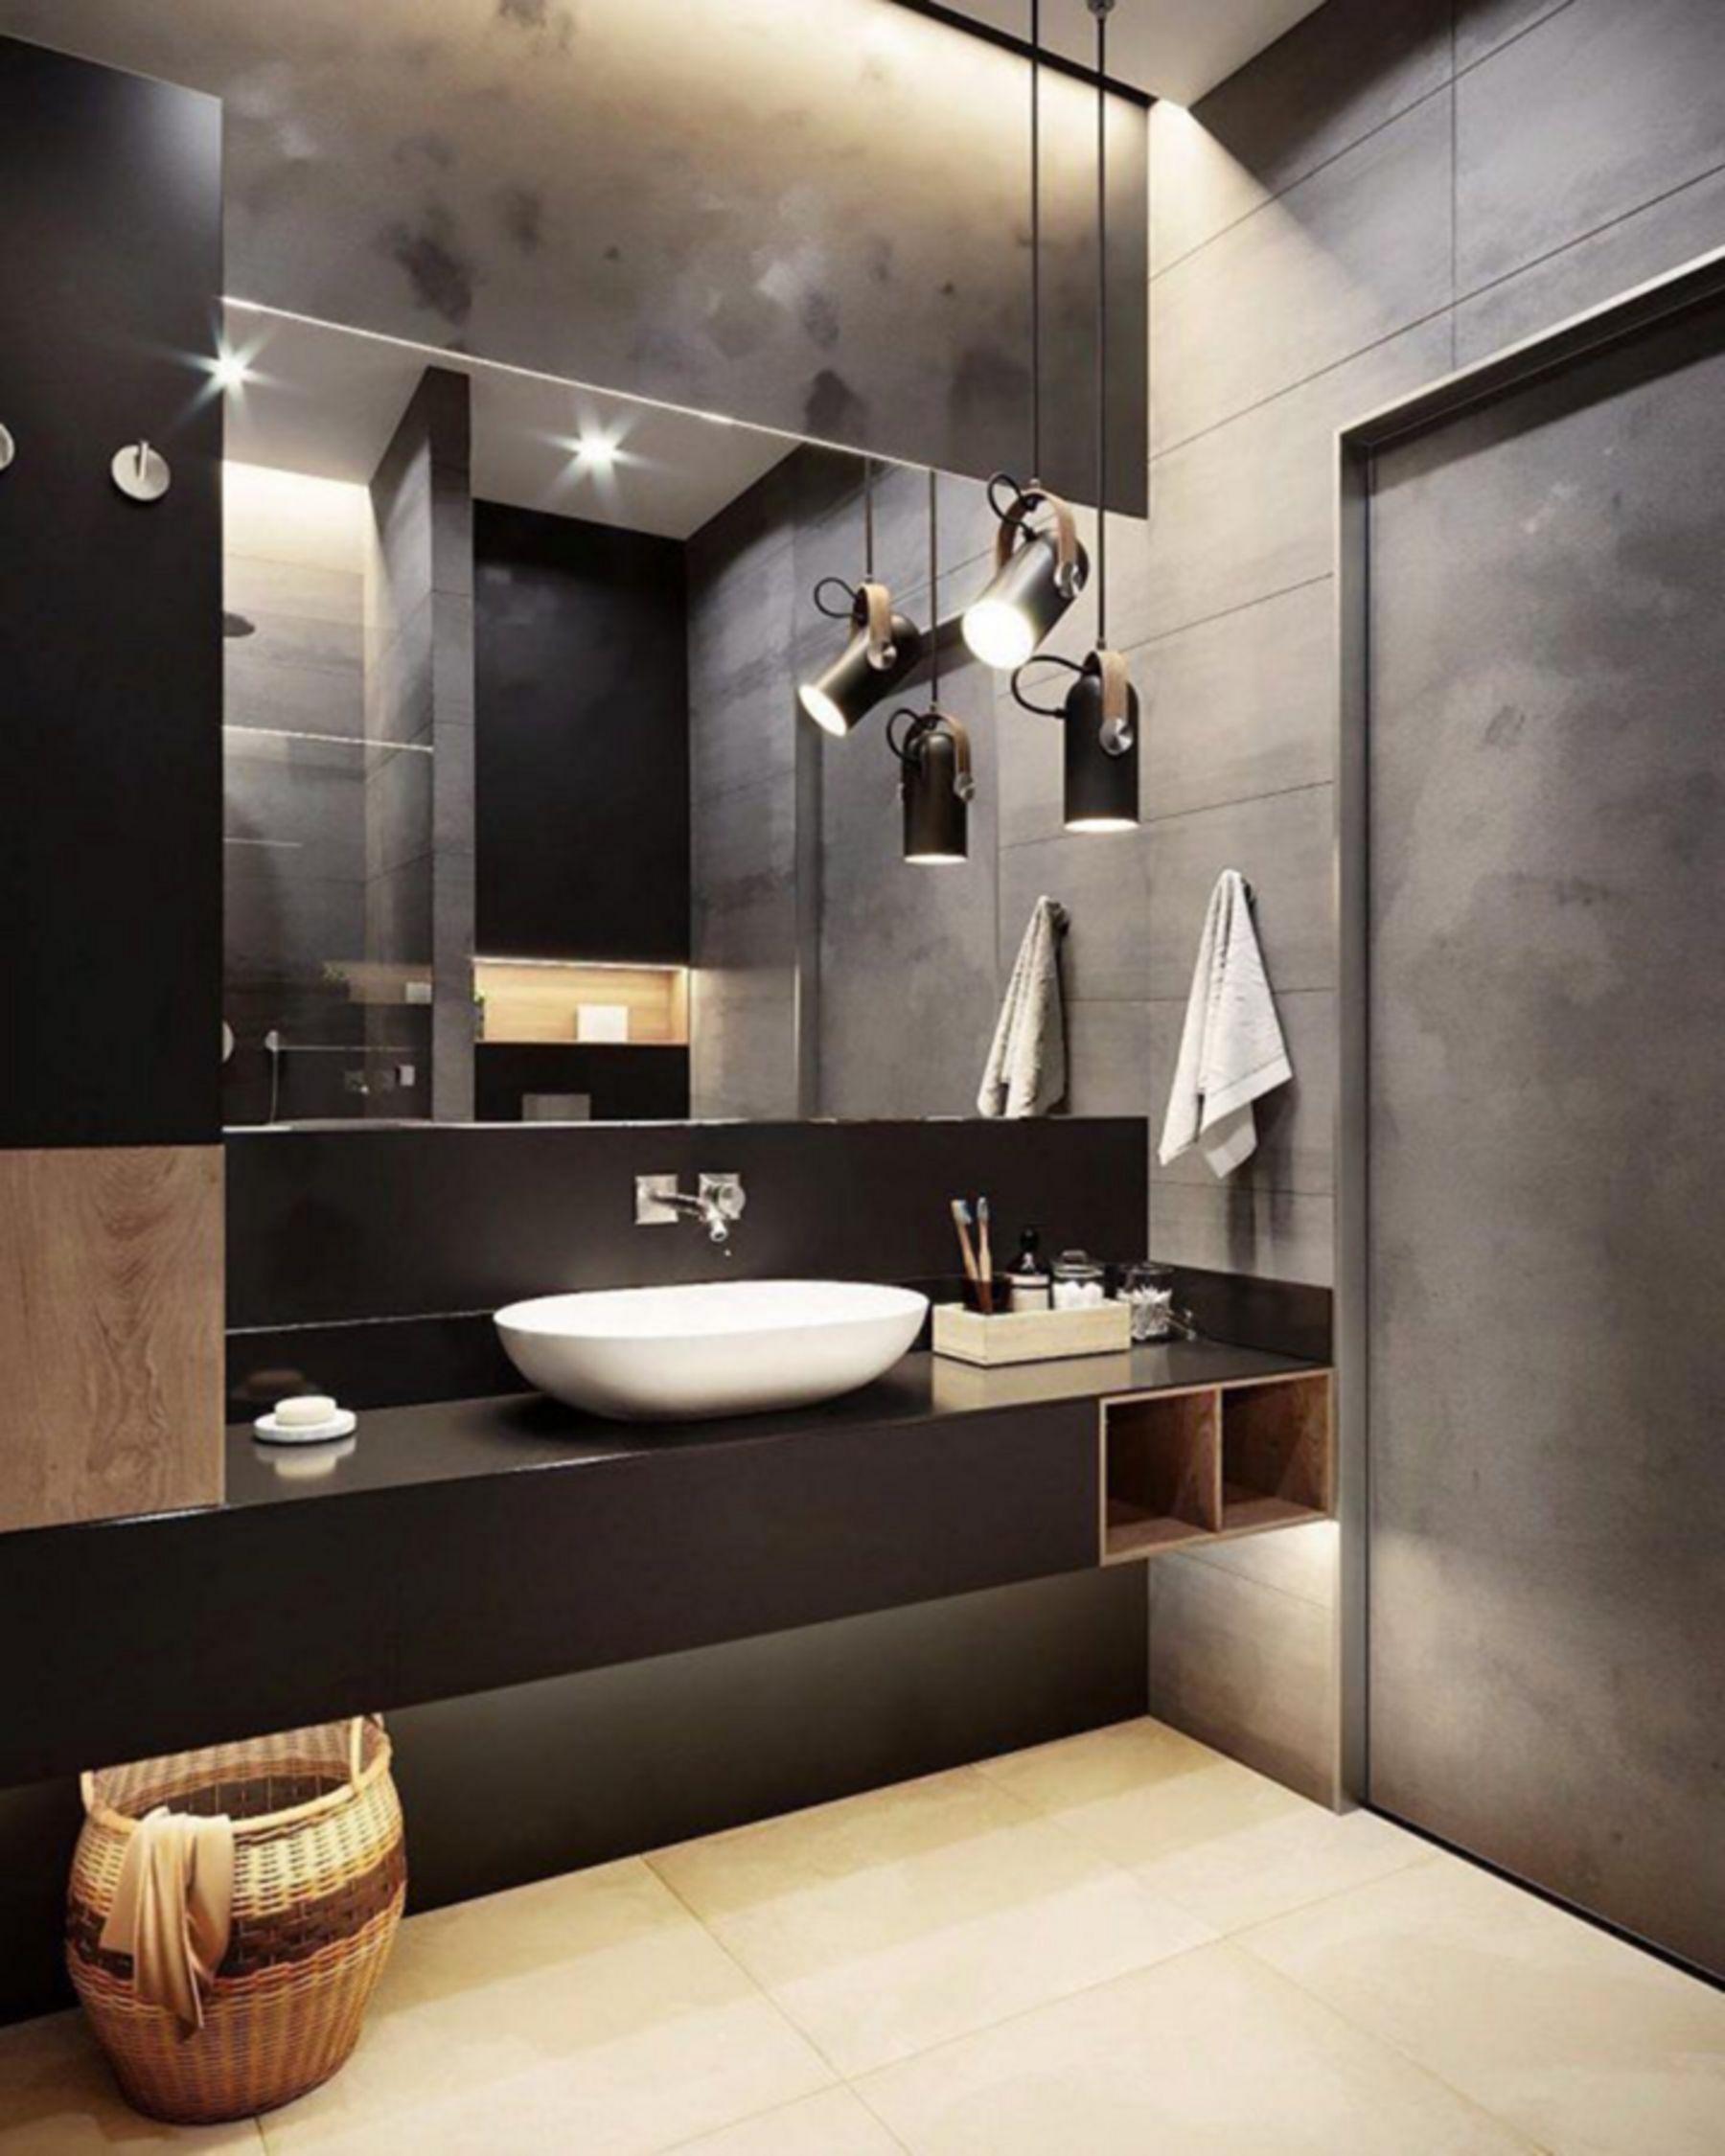 10 Simple Industrial Bathroom Design Ideas That Will Make Your Bathroom Impression Lux In 2020 Bathroom Interior Design Industrial Bathroom Design Minimalist Bathroom